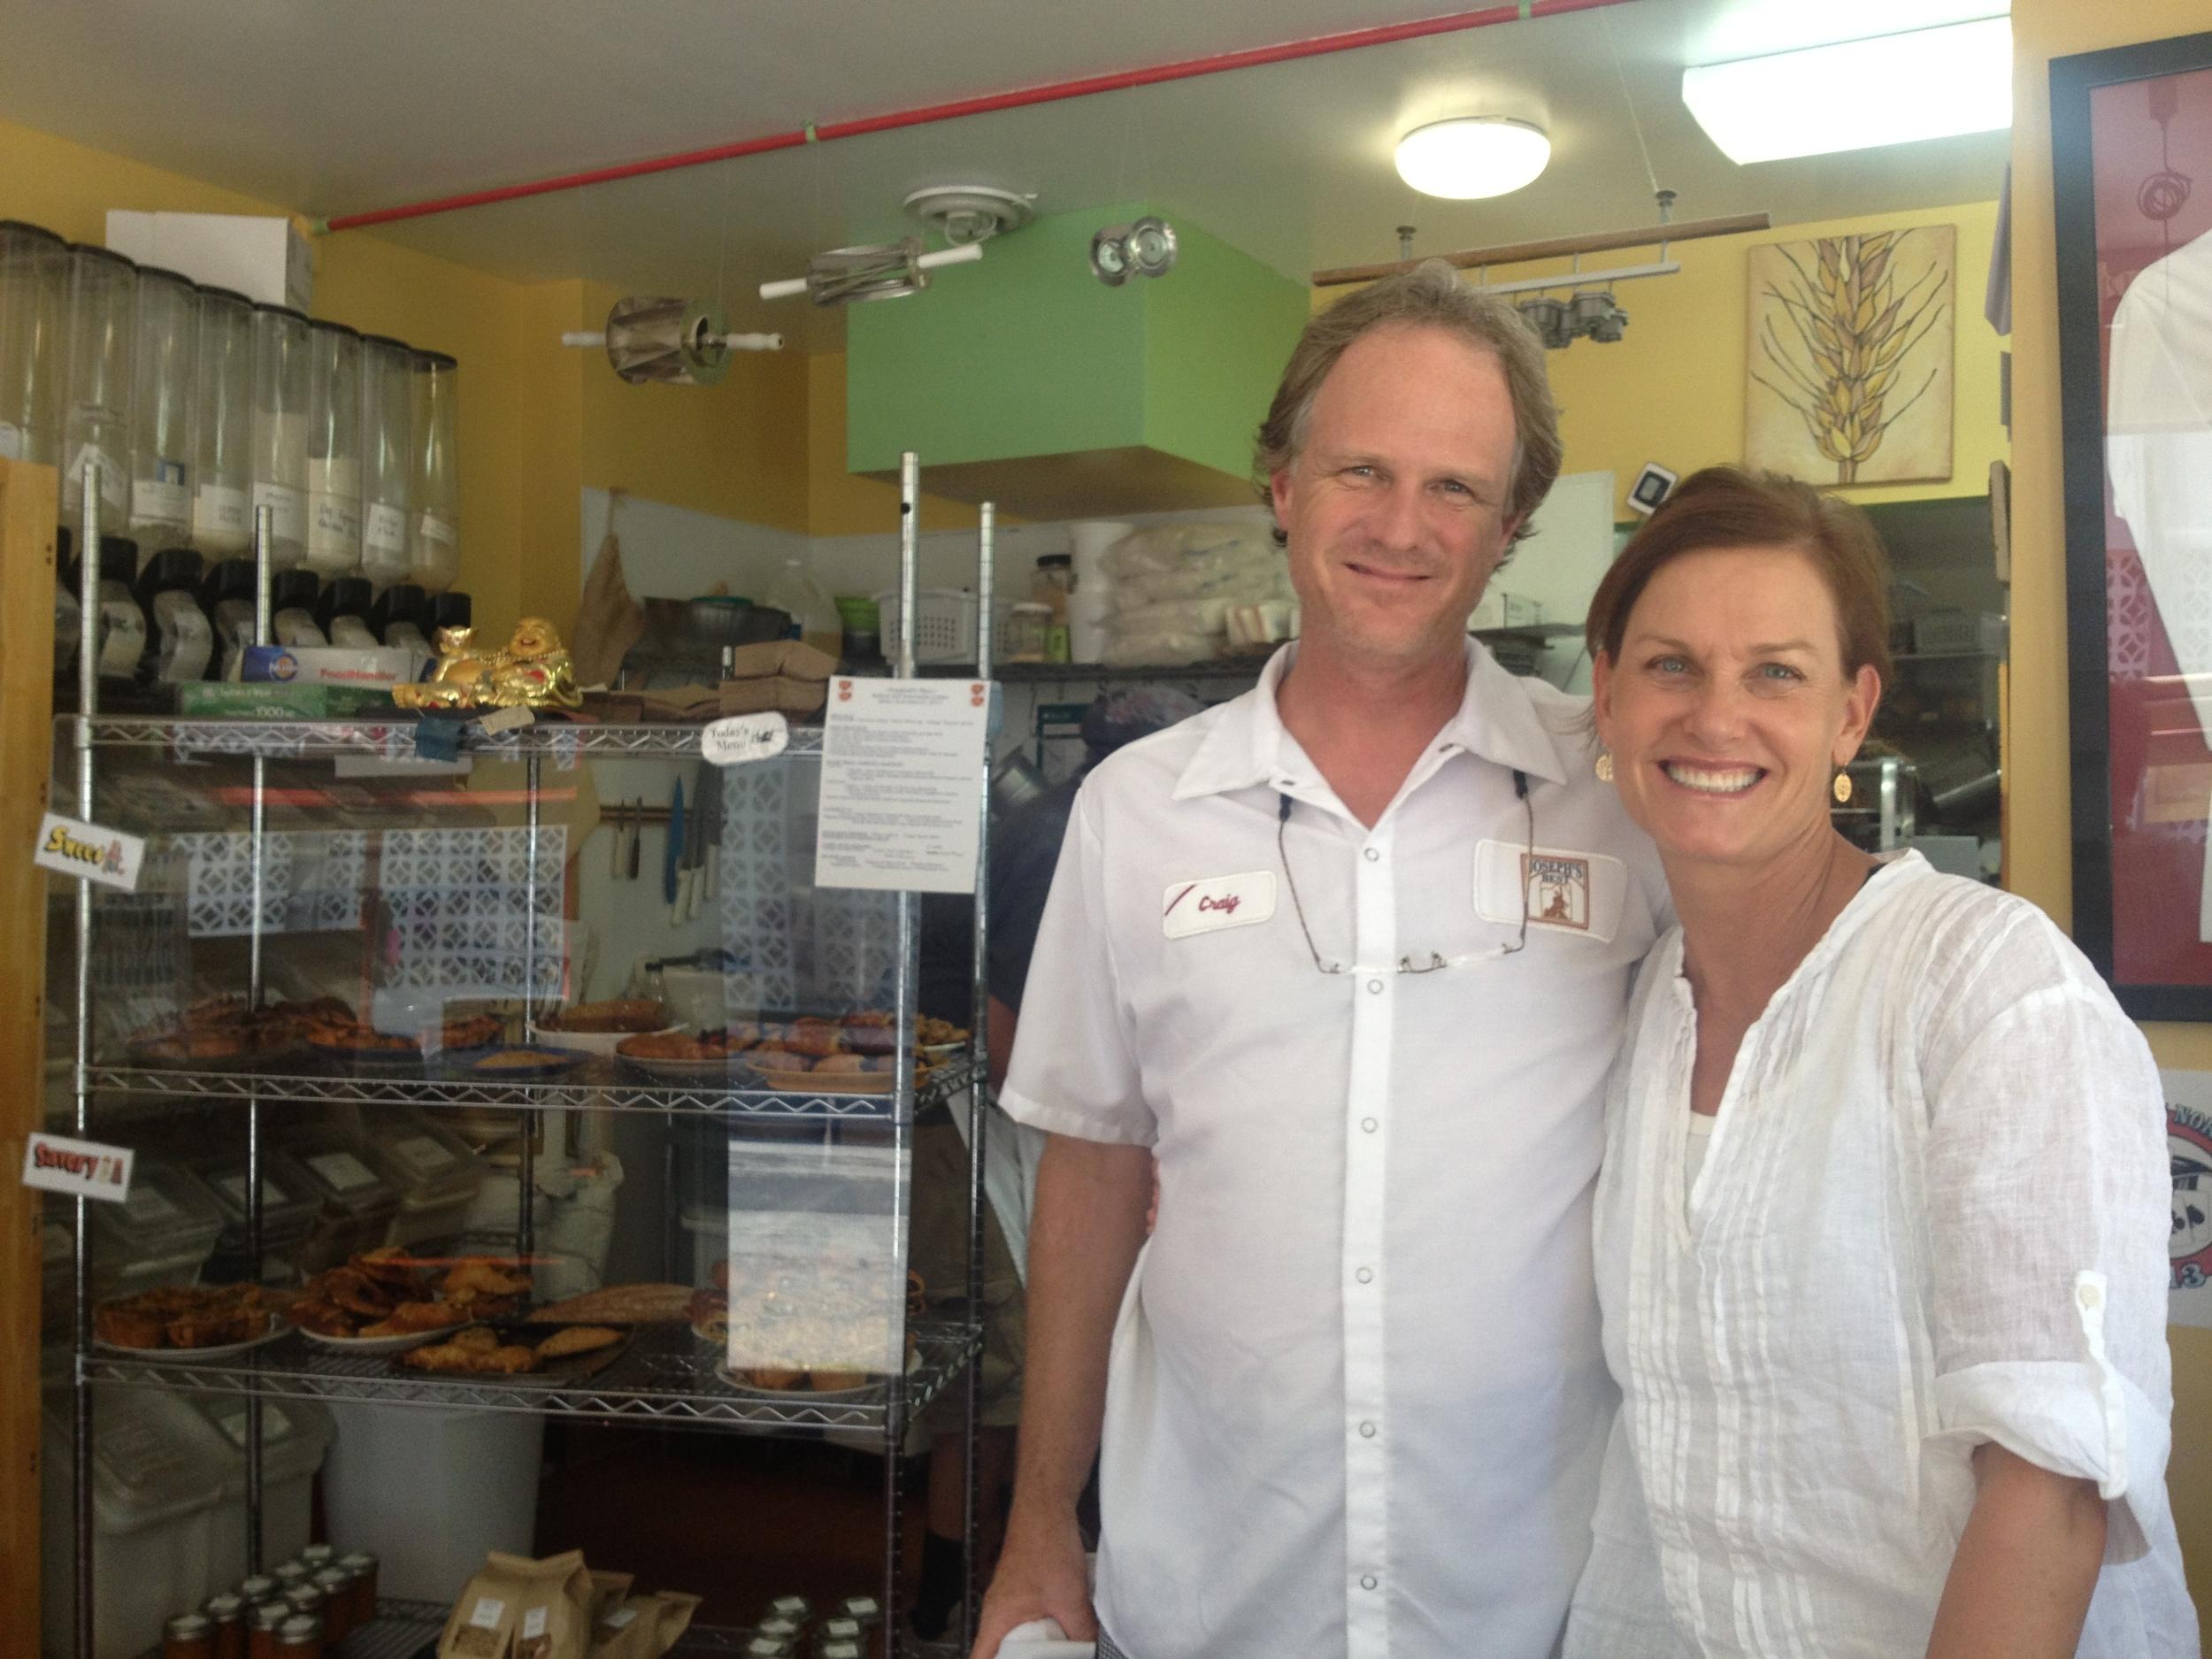 A visit with Craig Pondsford